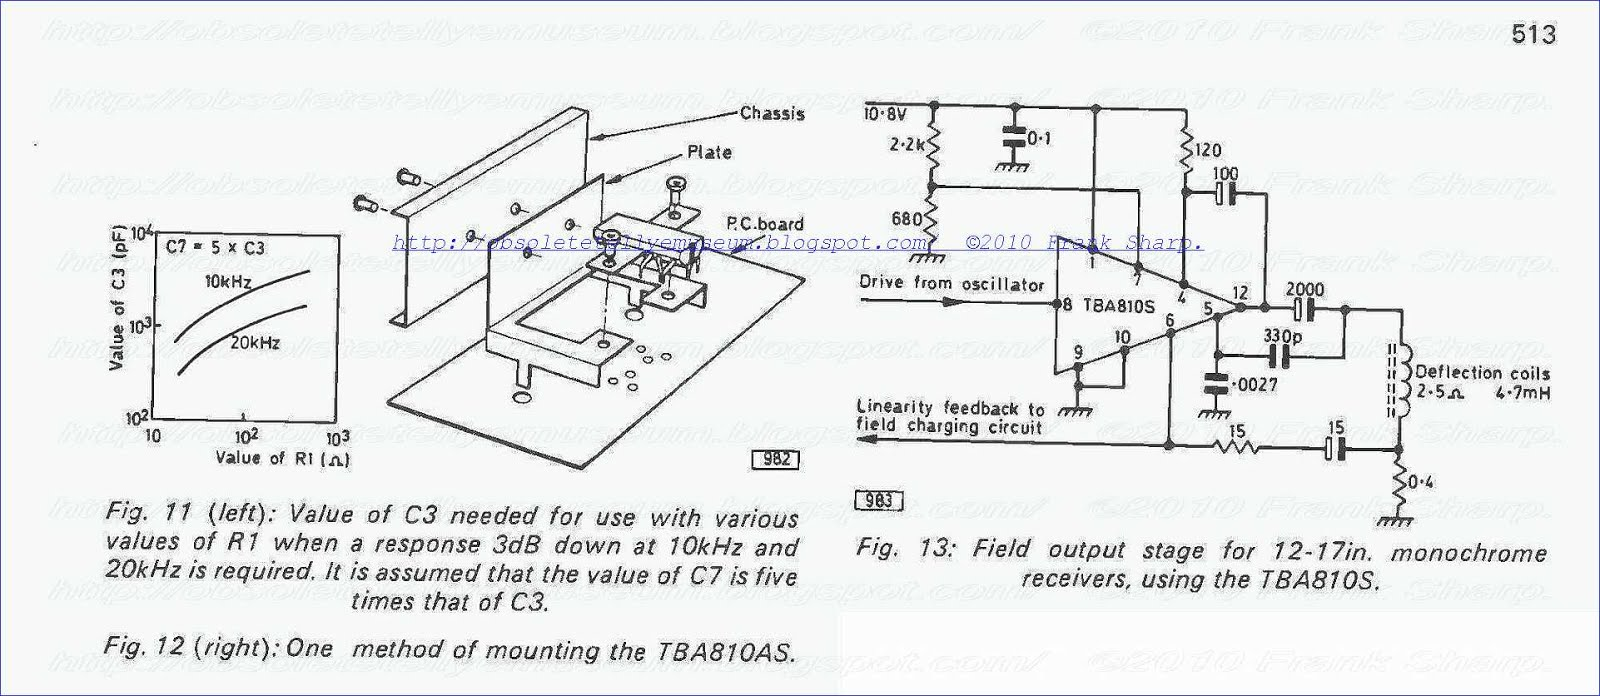 obsolete technology tellye ! itt schaub lorenz ideal color 1844 at Wiring  Diagram For Jacobs Ultra